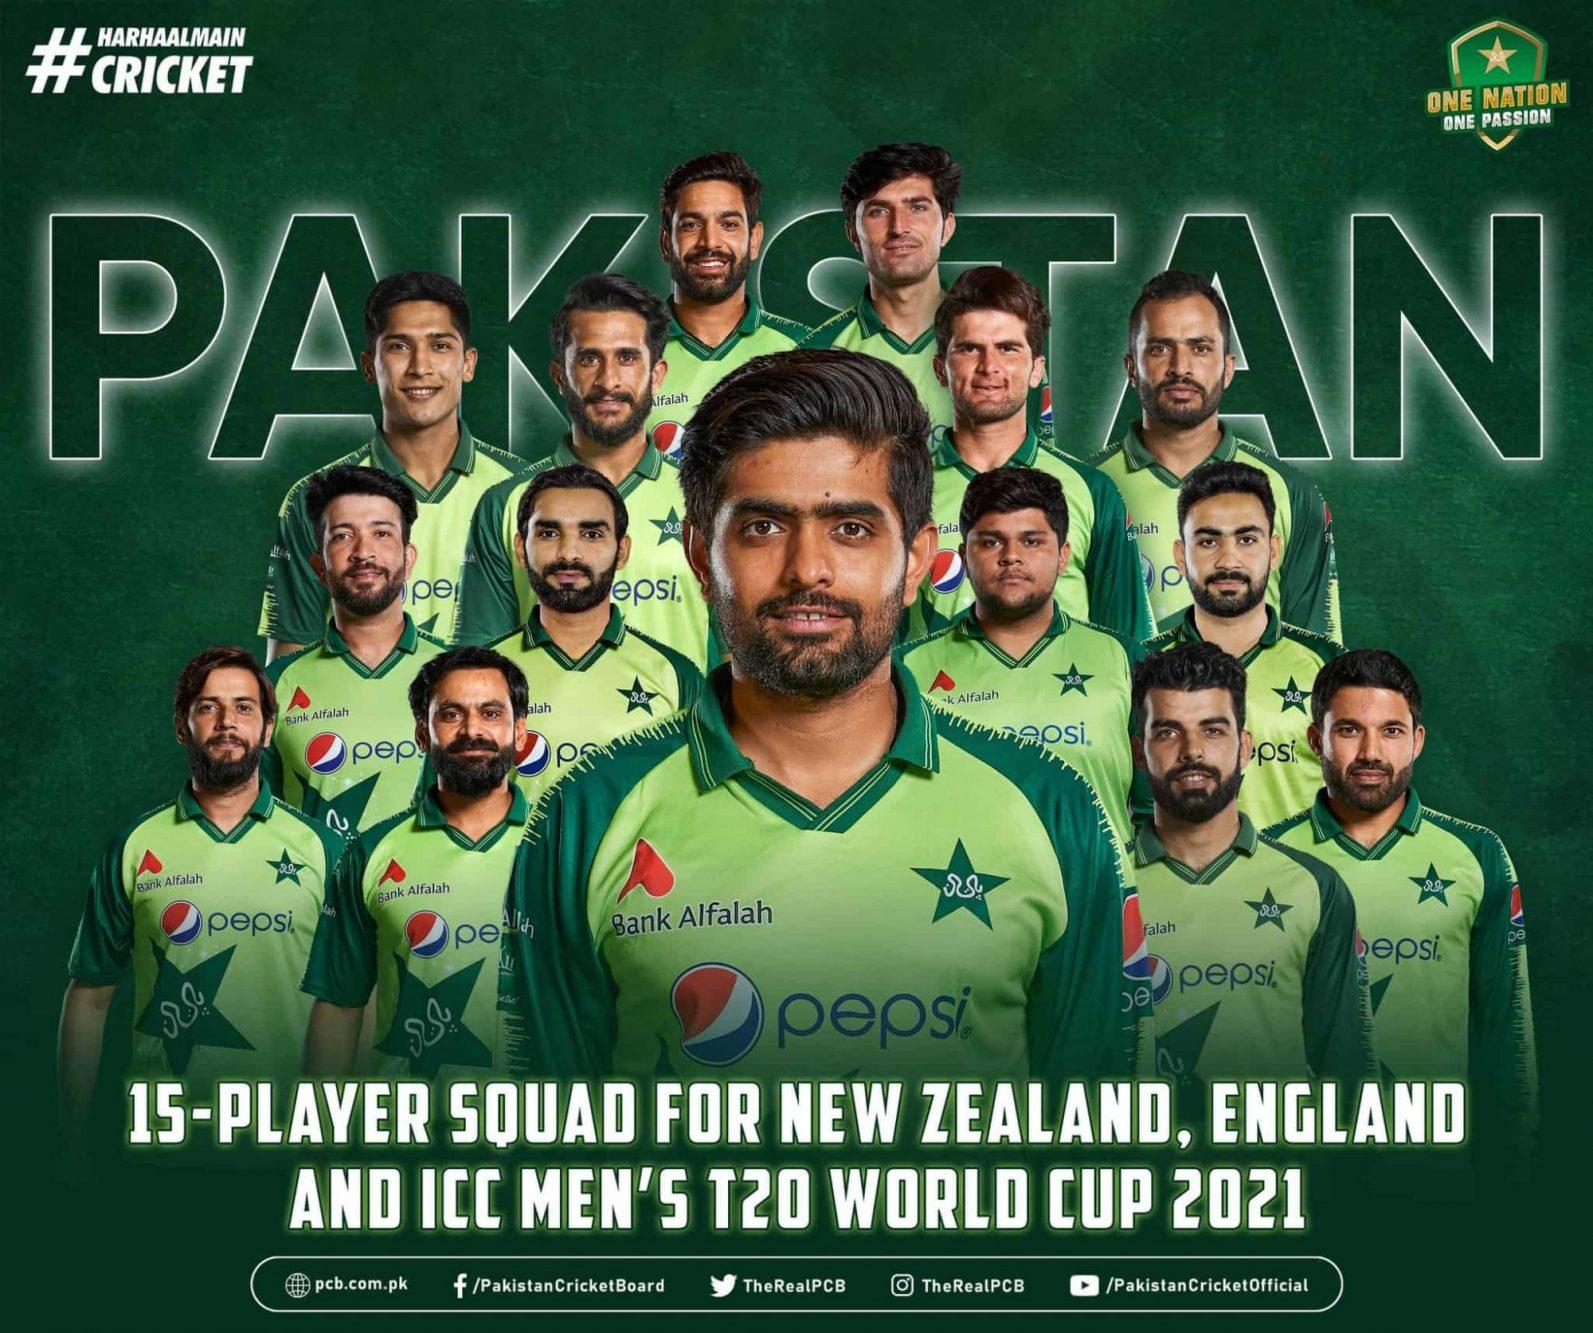 Shoaib Malik, Sarfaraz Ahmed Dropped As Pakistan Announce Squad For T20 World Cup